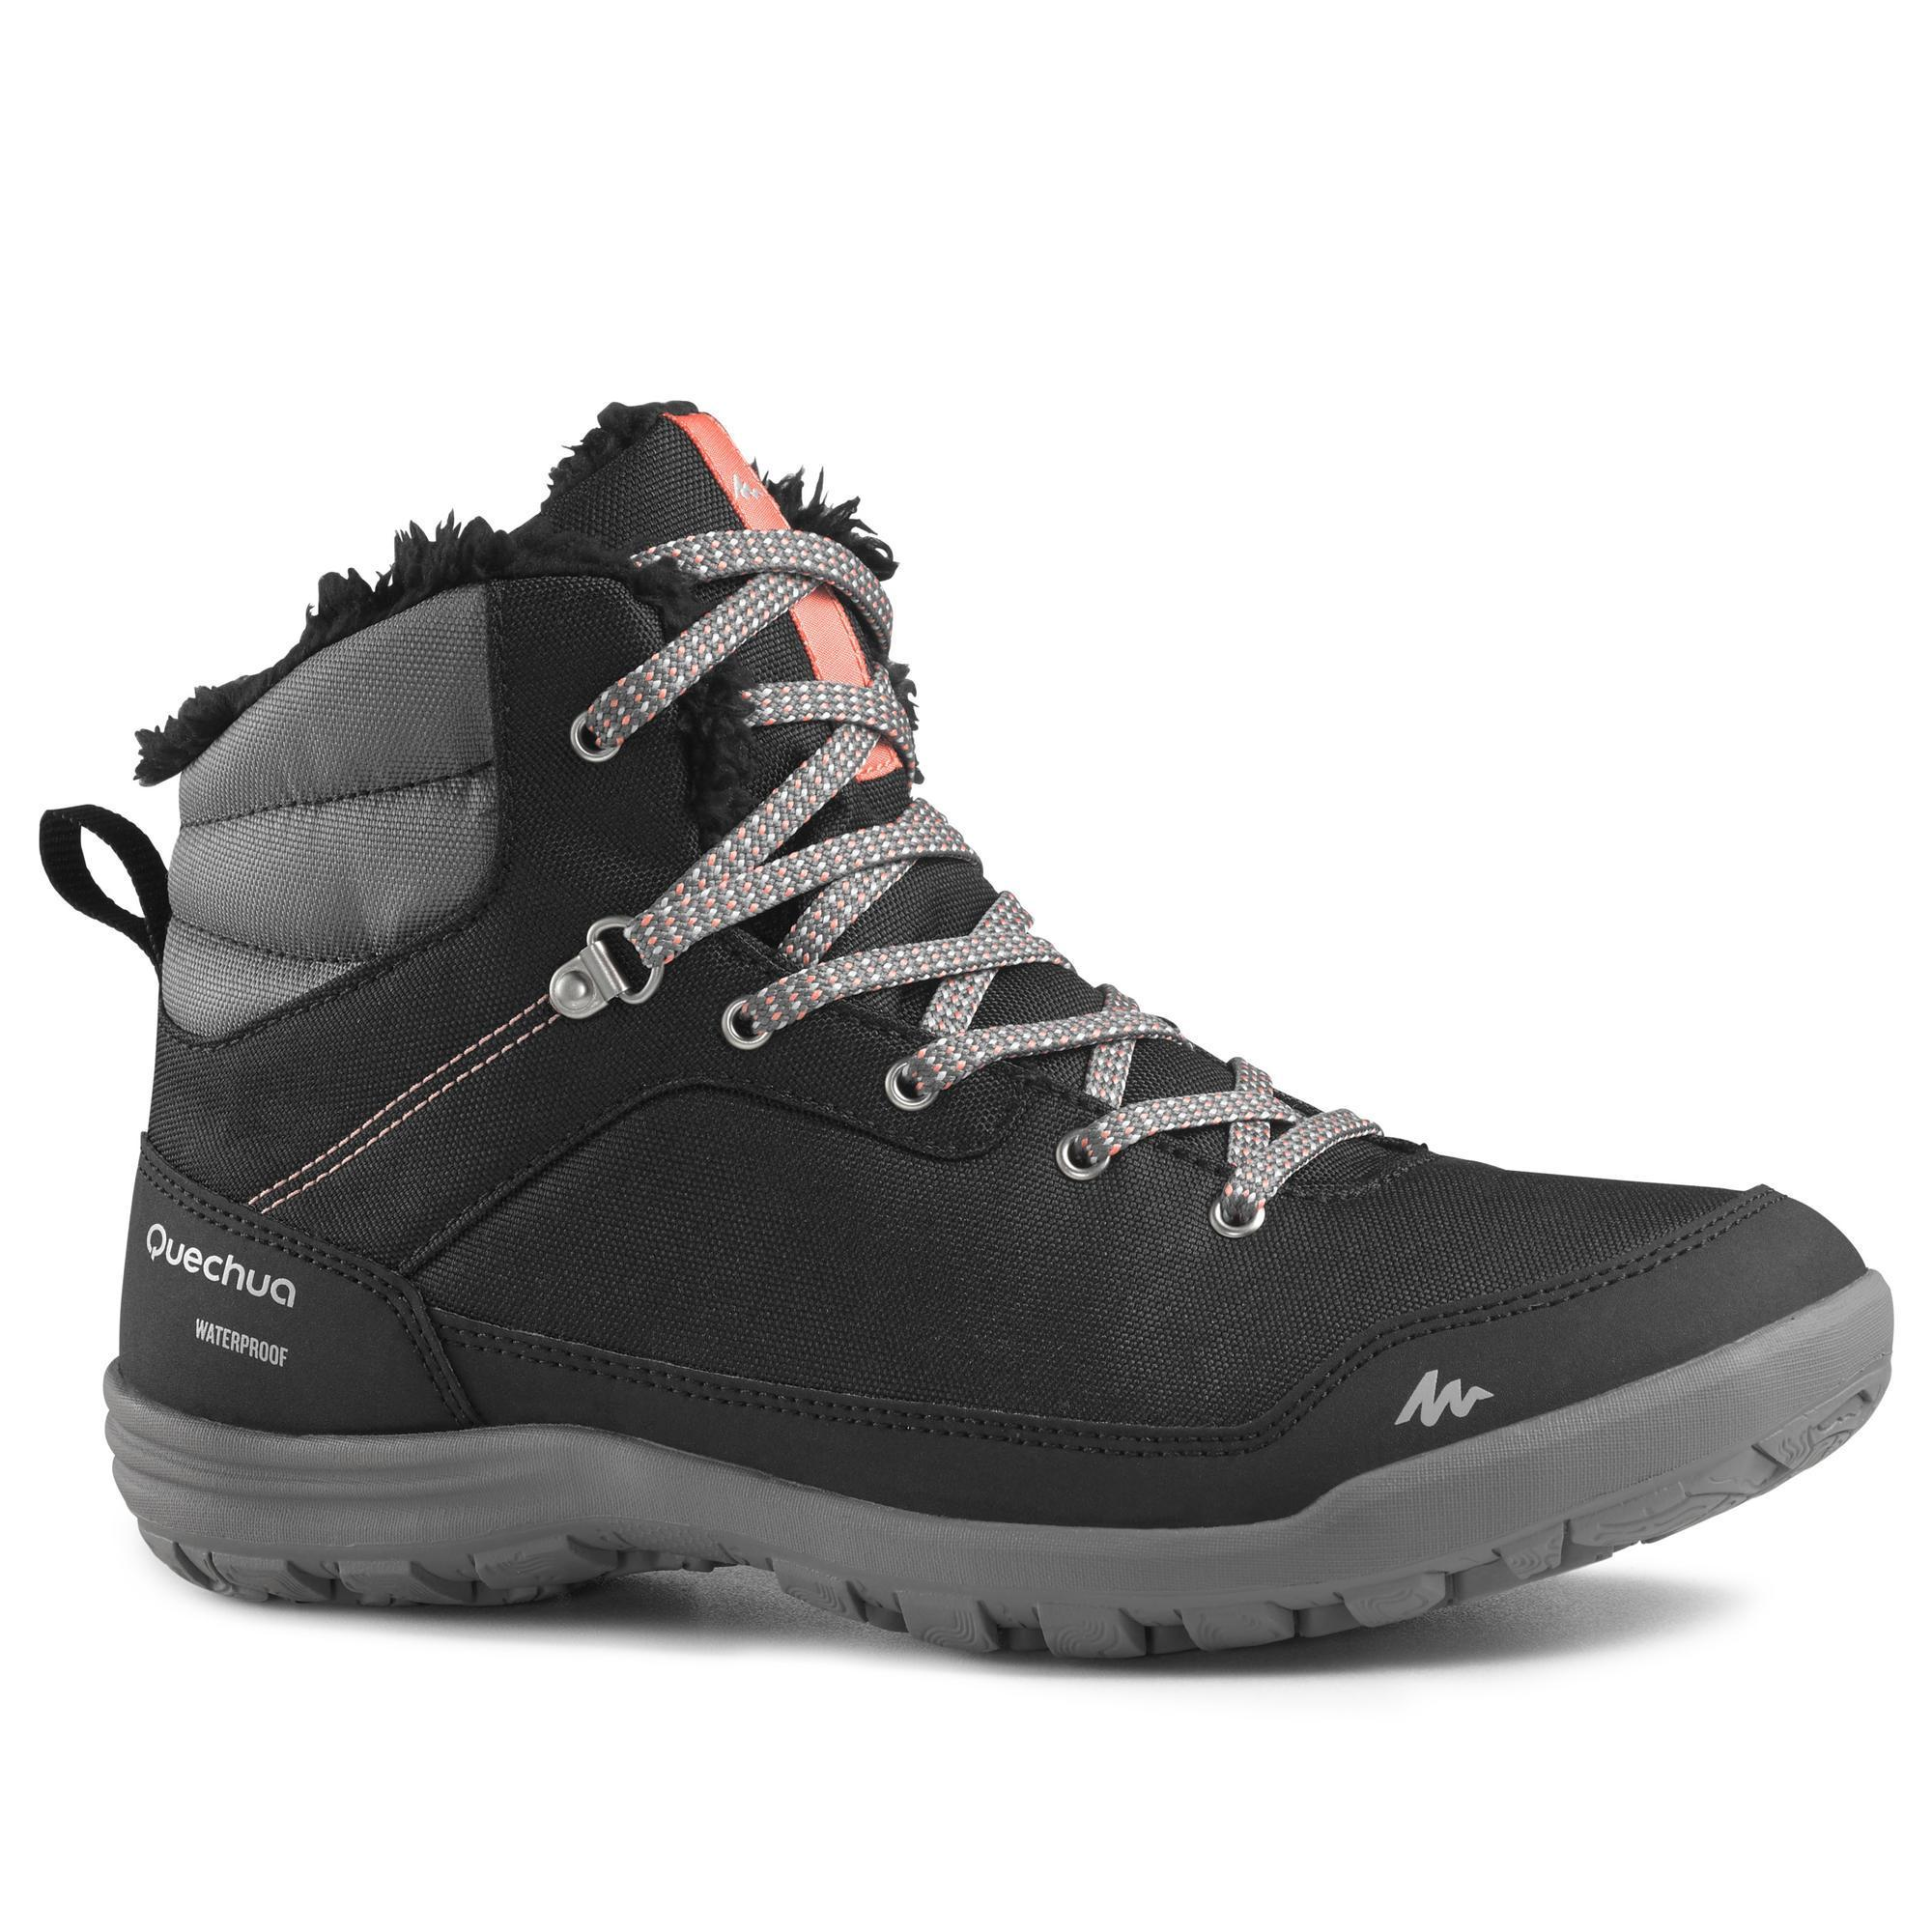 Waterproof Hiking Boots - Red/Burgundy